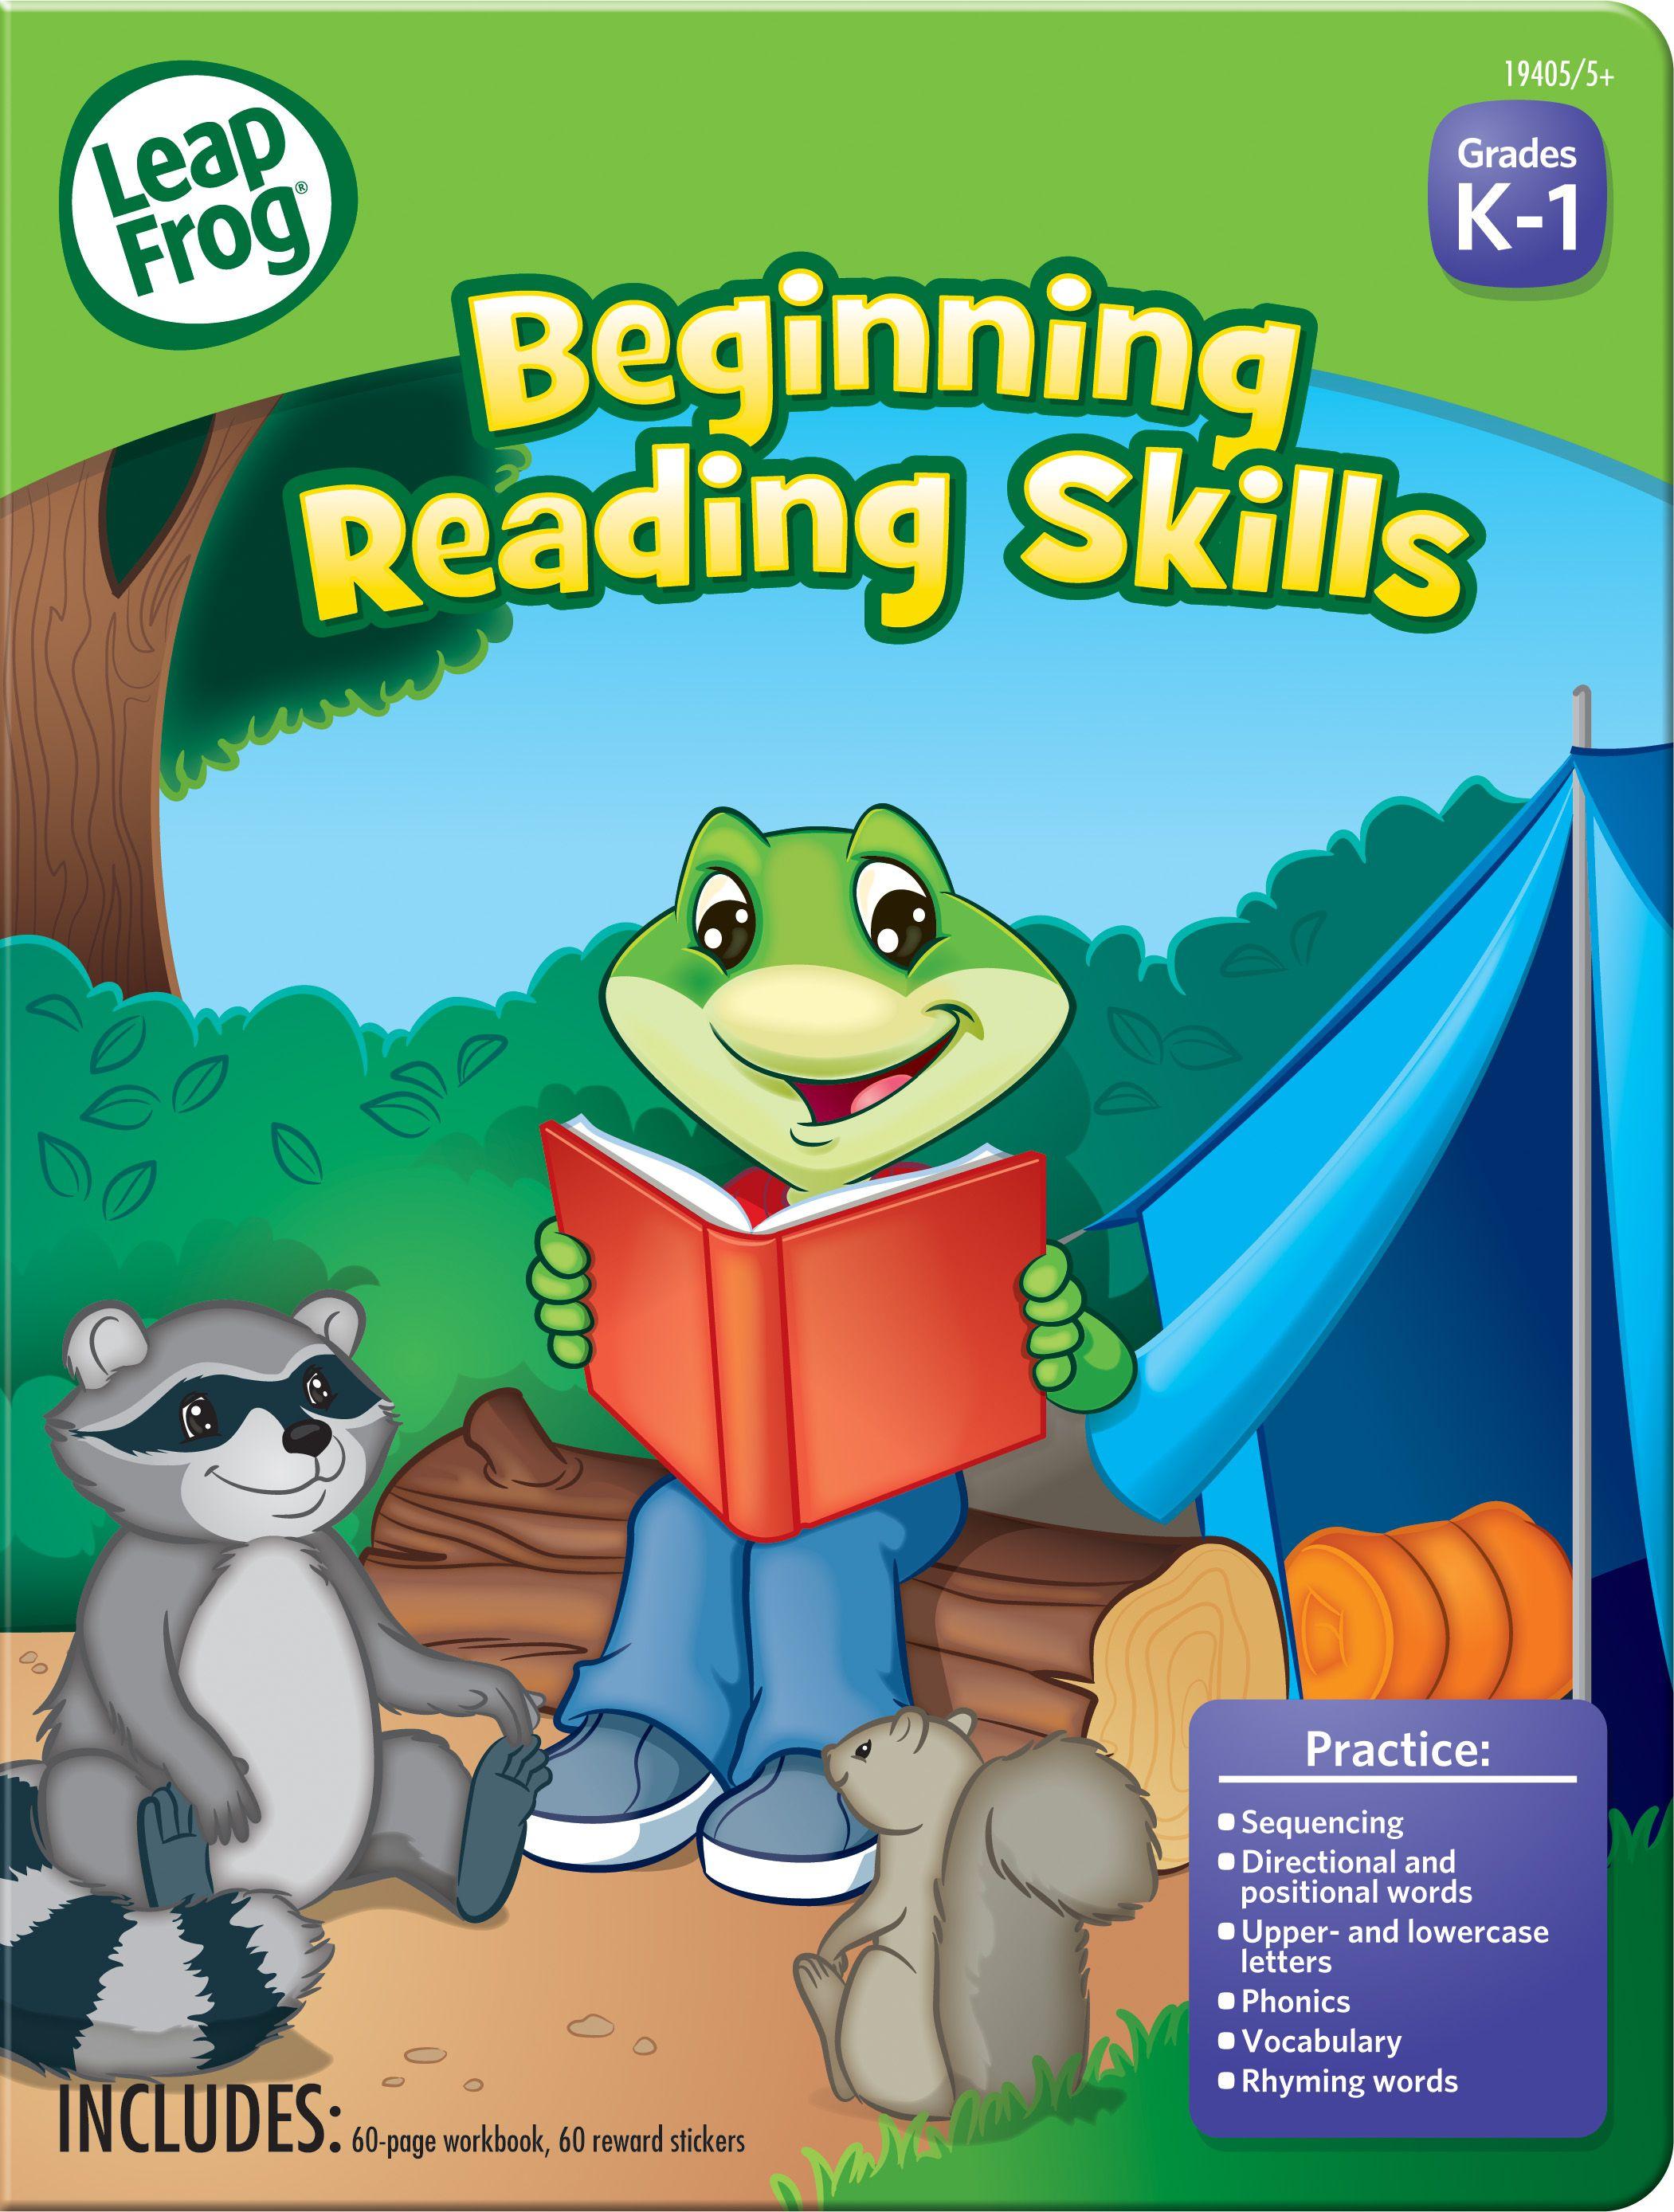 The Leapfrog Beginning Reading Skills Workbook Reinforces Key Skills Children Need To Succeed